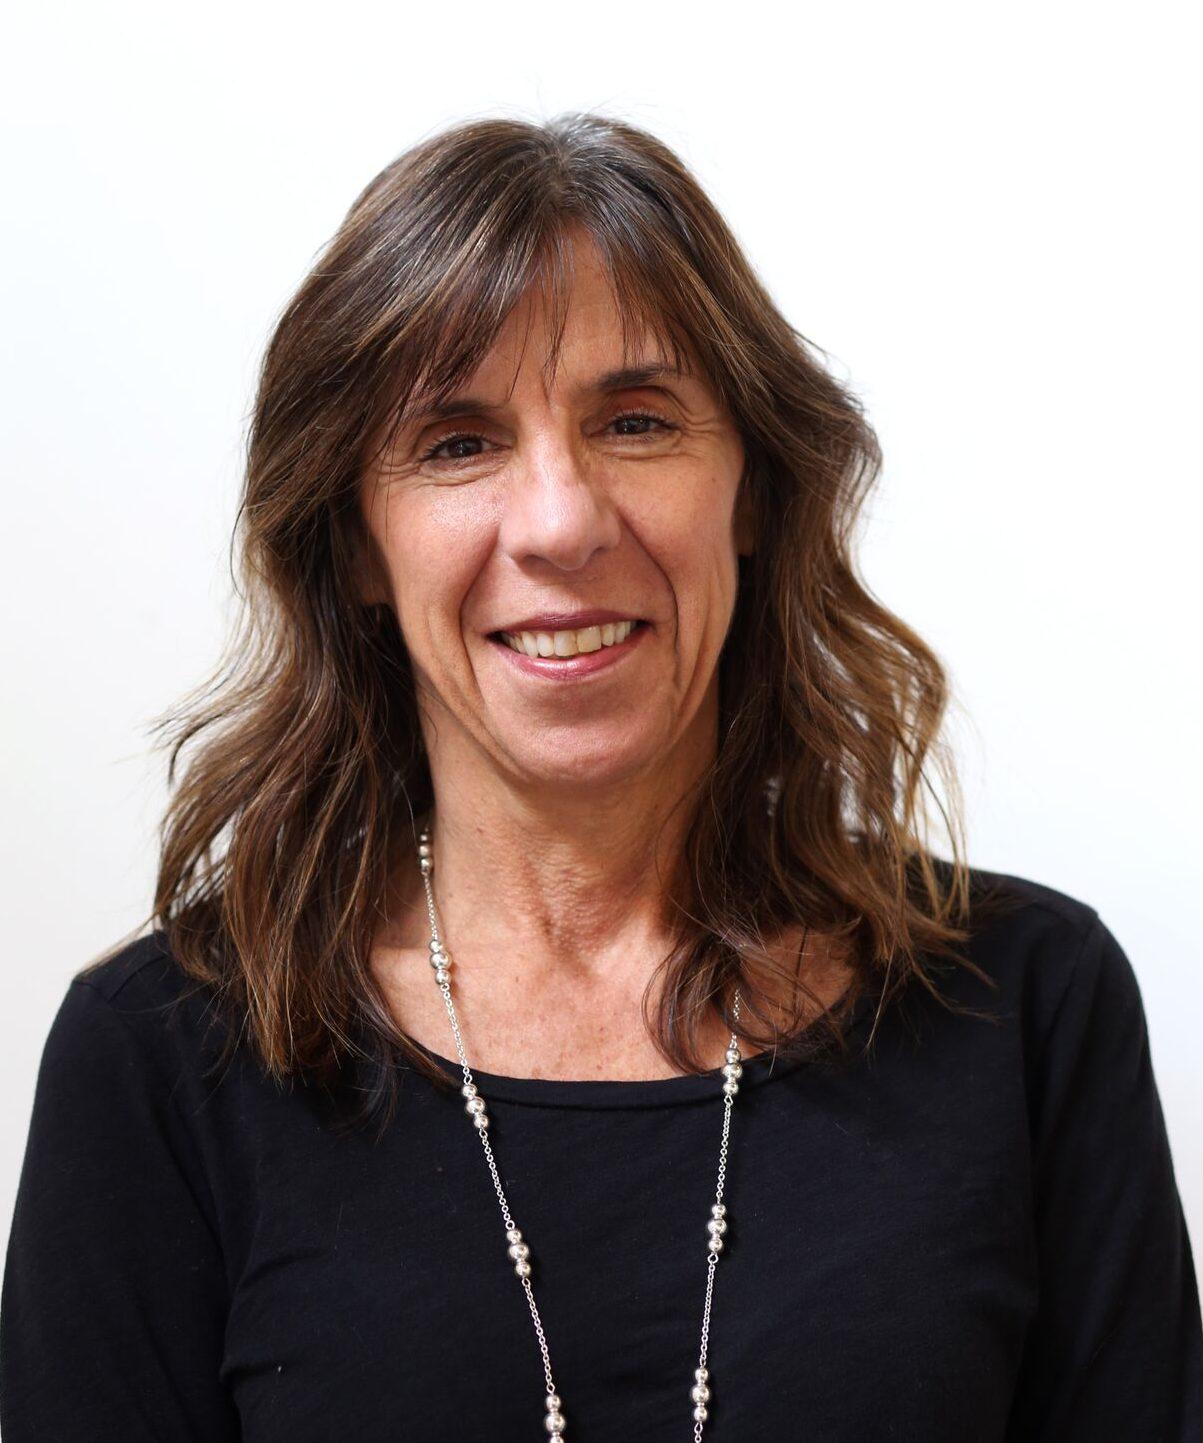 Kathy Meladossi